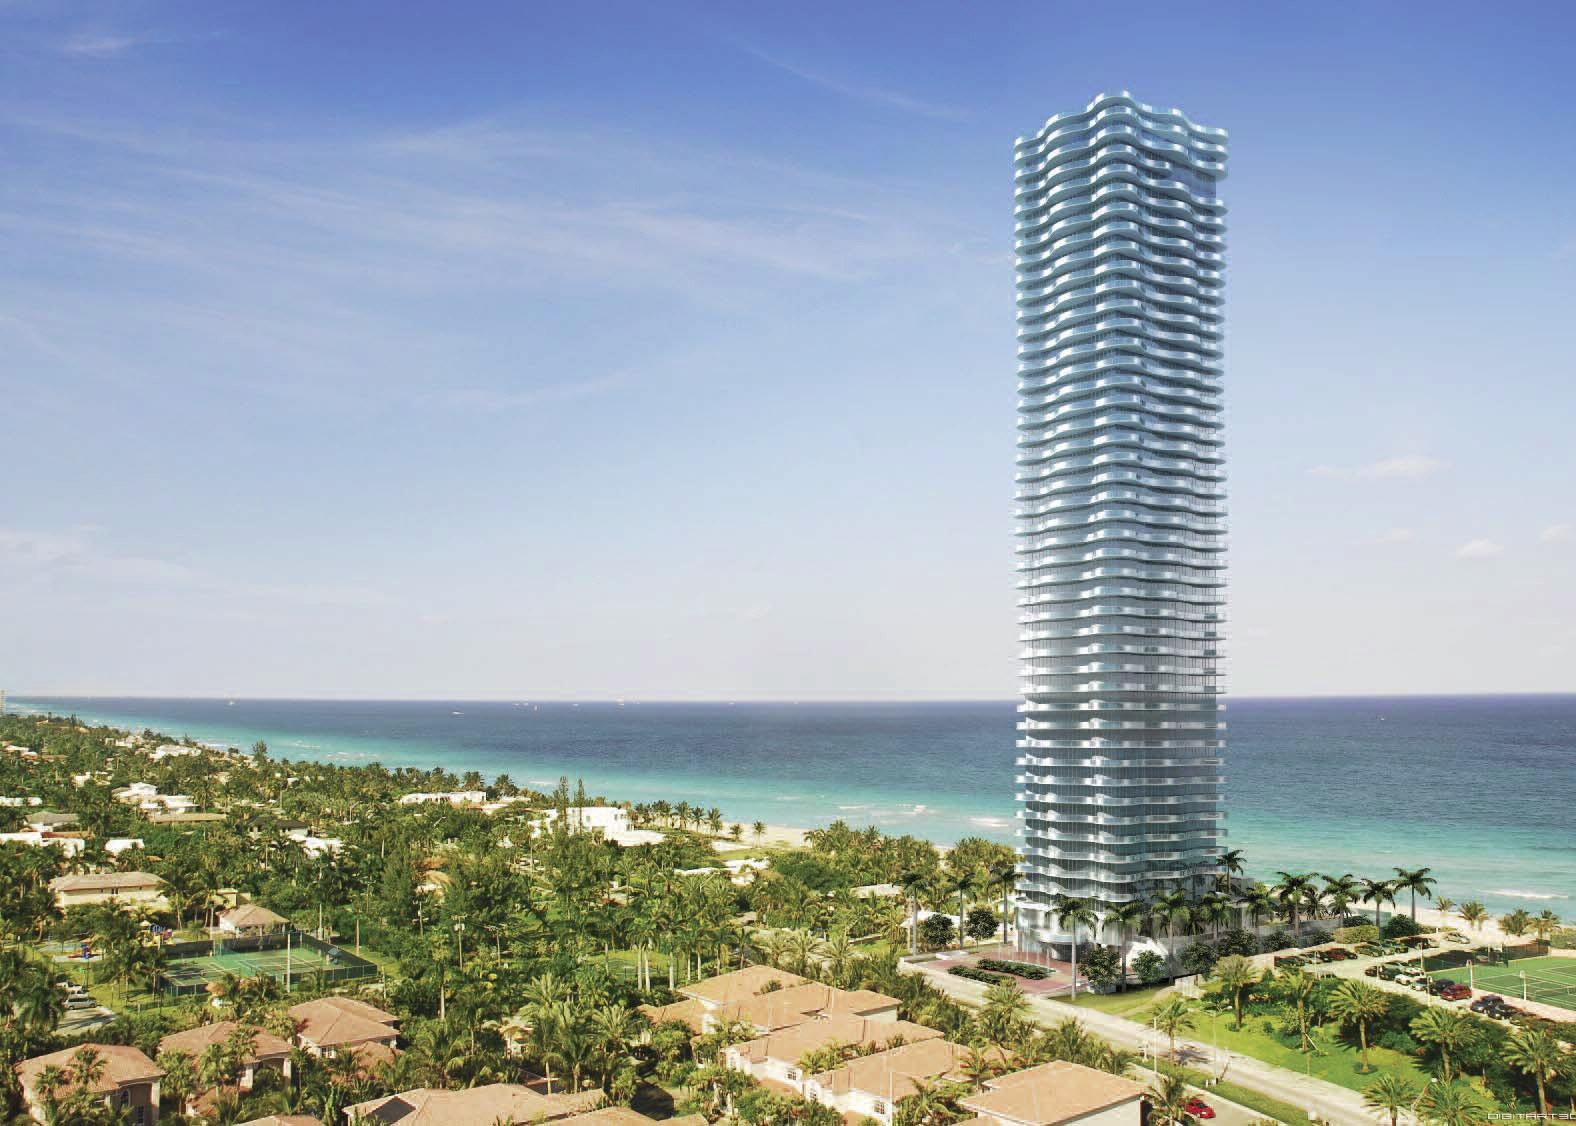 39 Stories Of Bliss At Regalia Miami Miami Pre Construction Condos